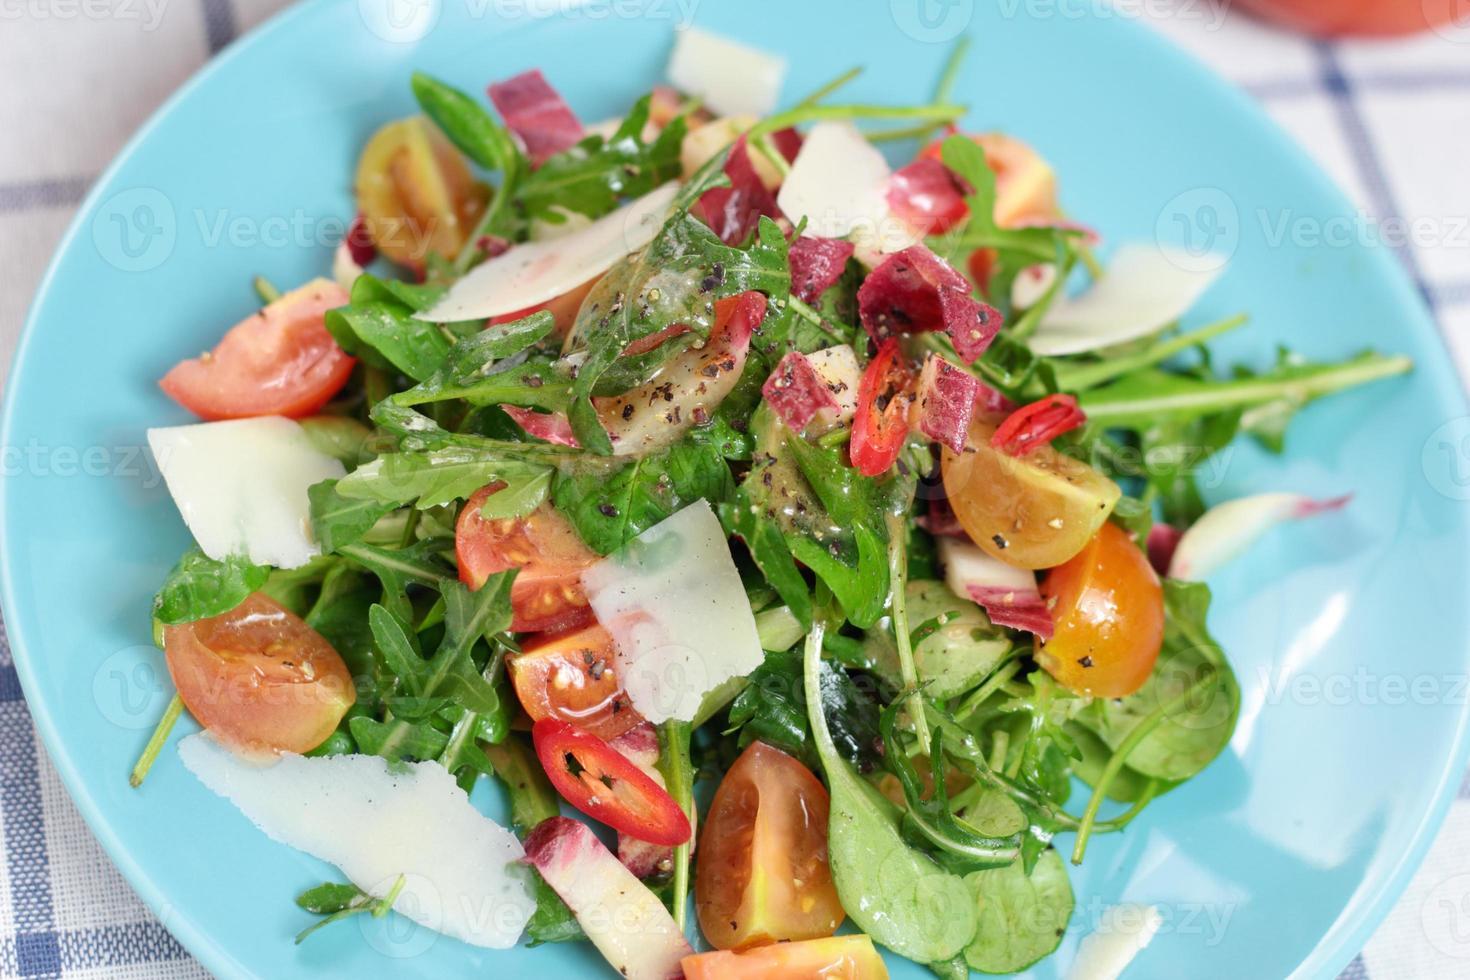 Tomato and lettuce salad. photo